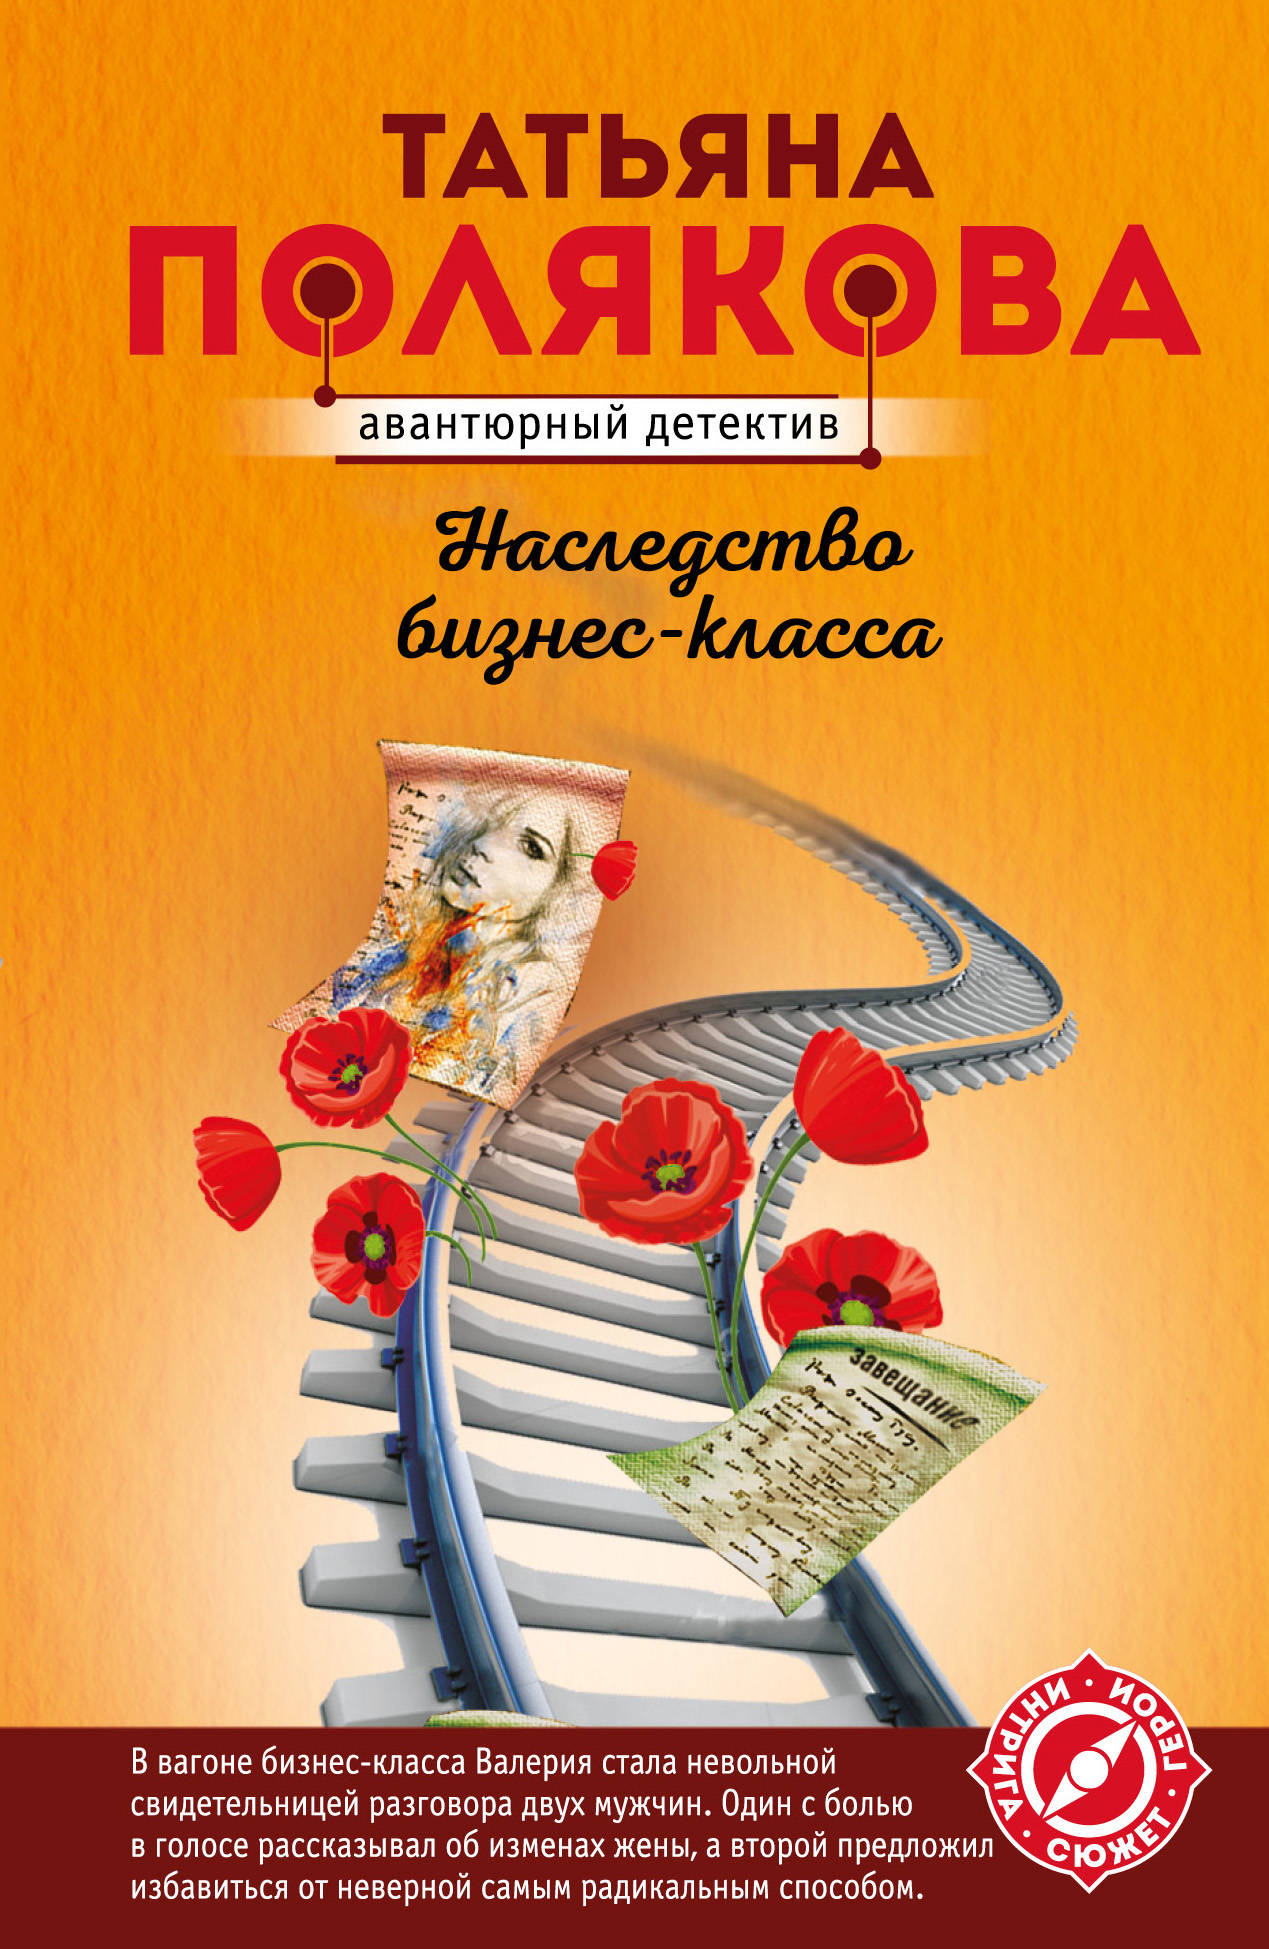 Татьяна Полякова Наследство бизнес-класса